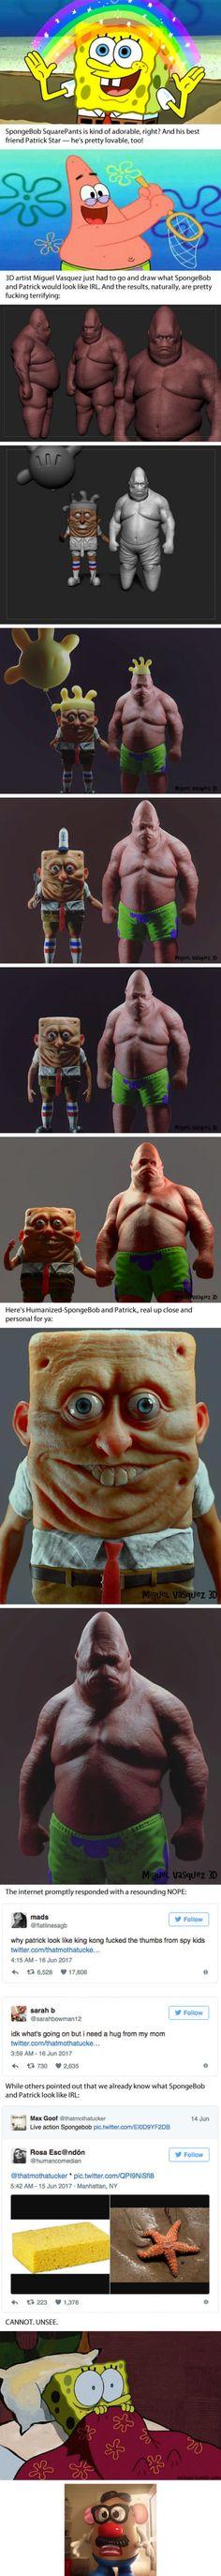 Artist drew SpongeBob and Patrick as a real-life human